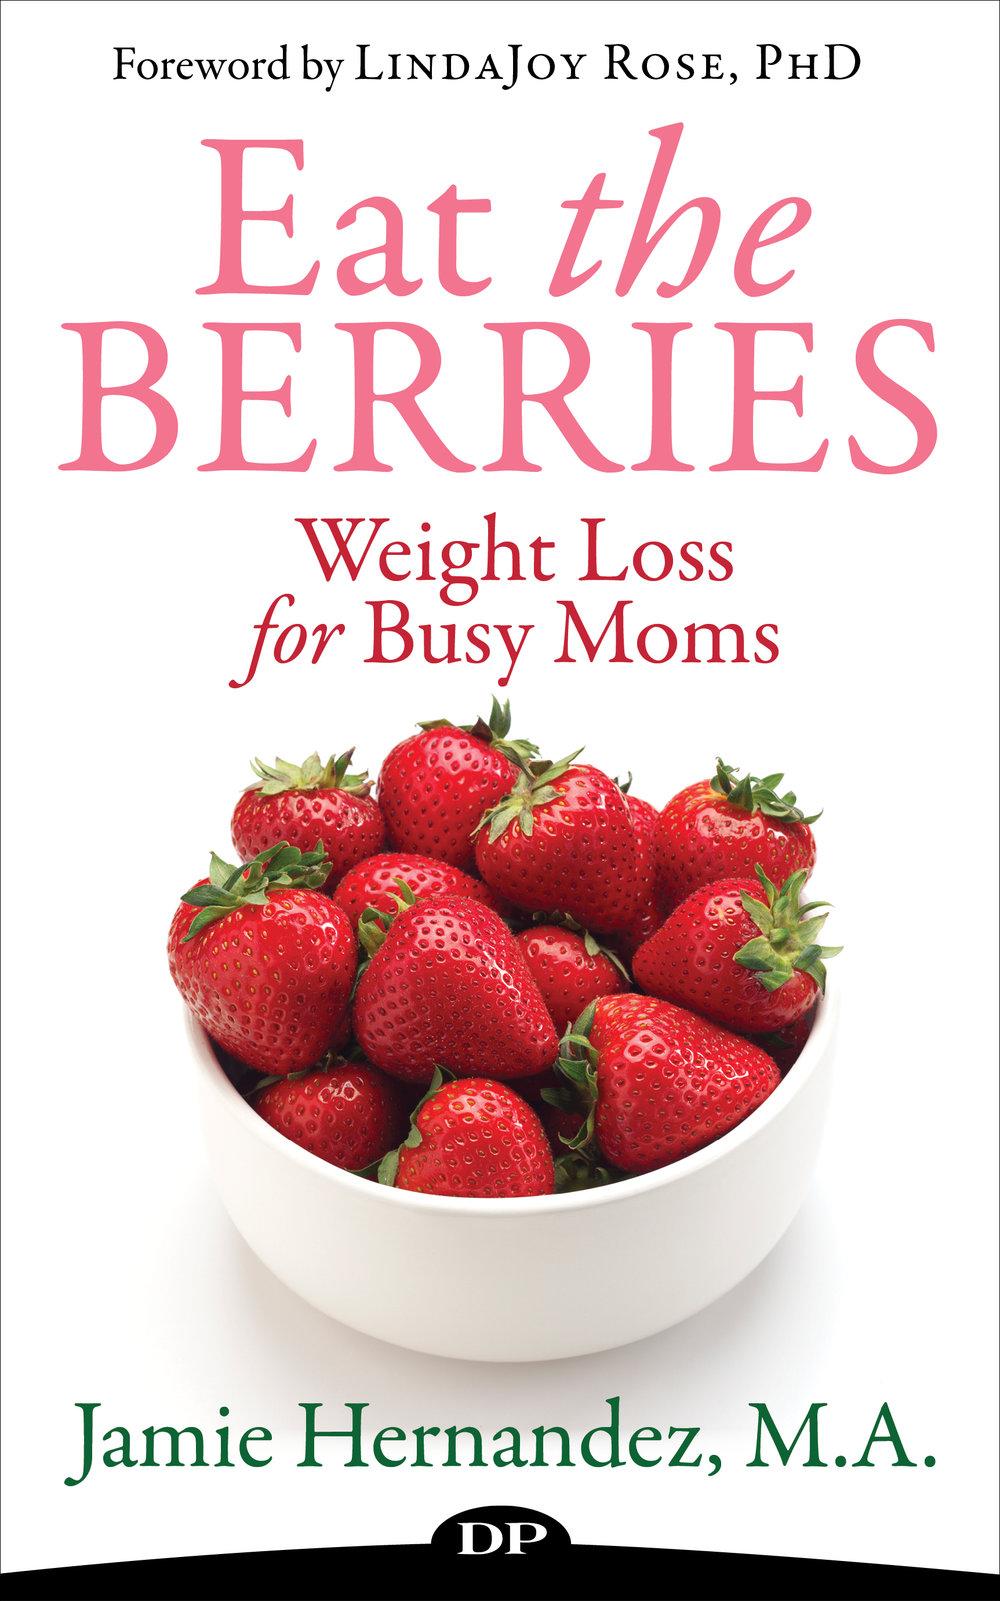 Hernandez_Eat the Berries_EBK_FINAL_KEYLINE.jpg